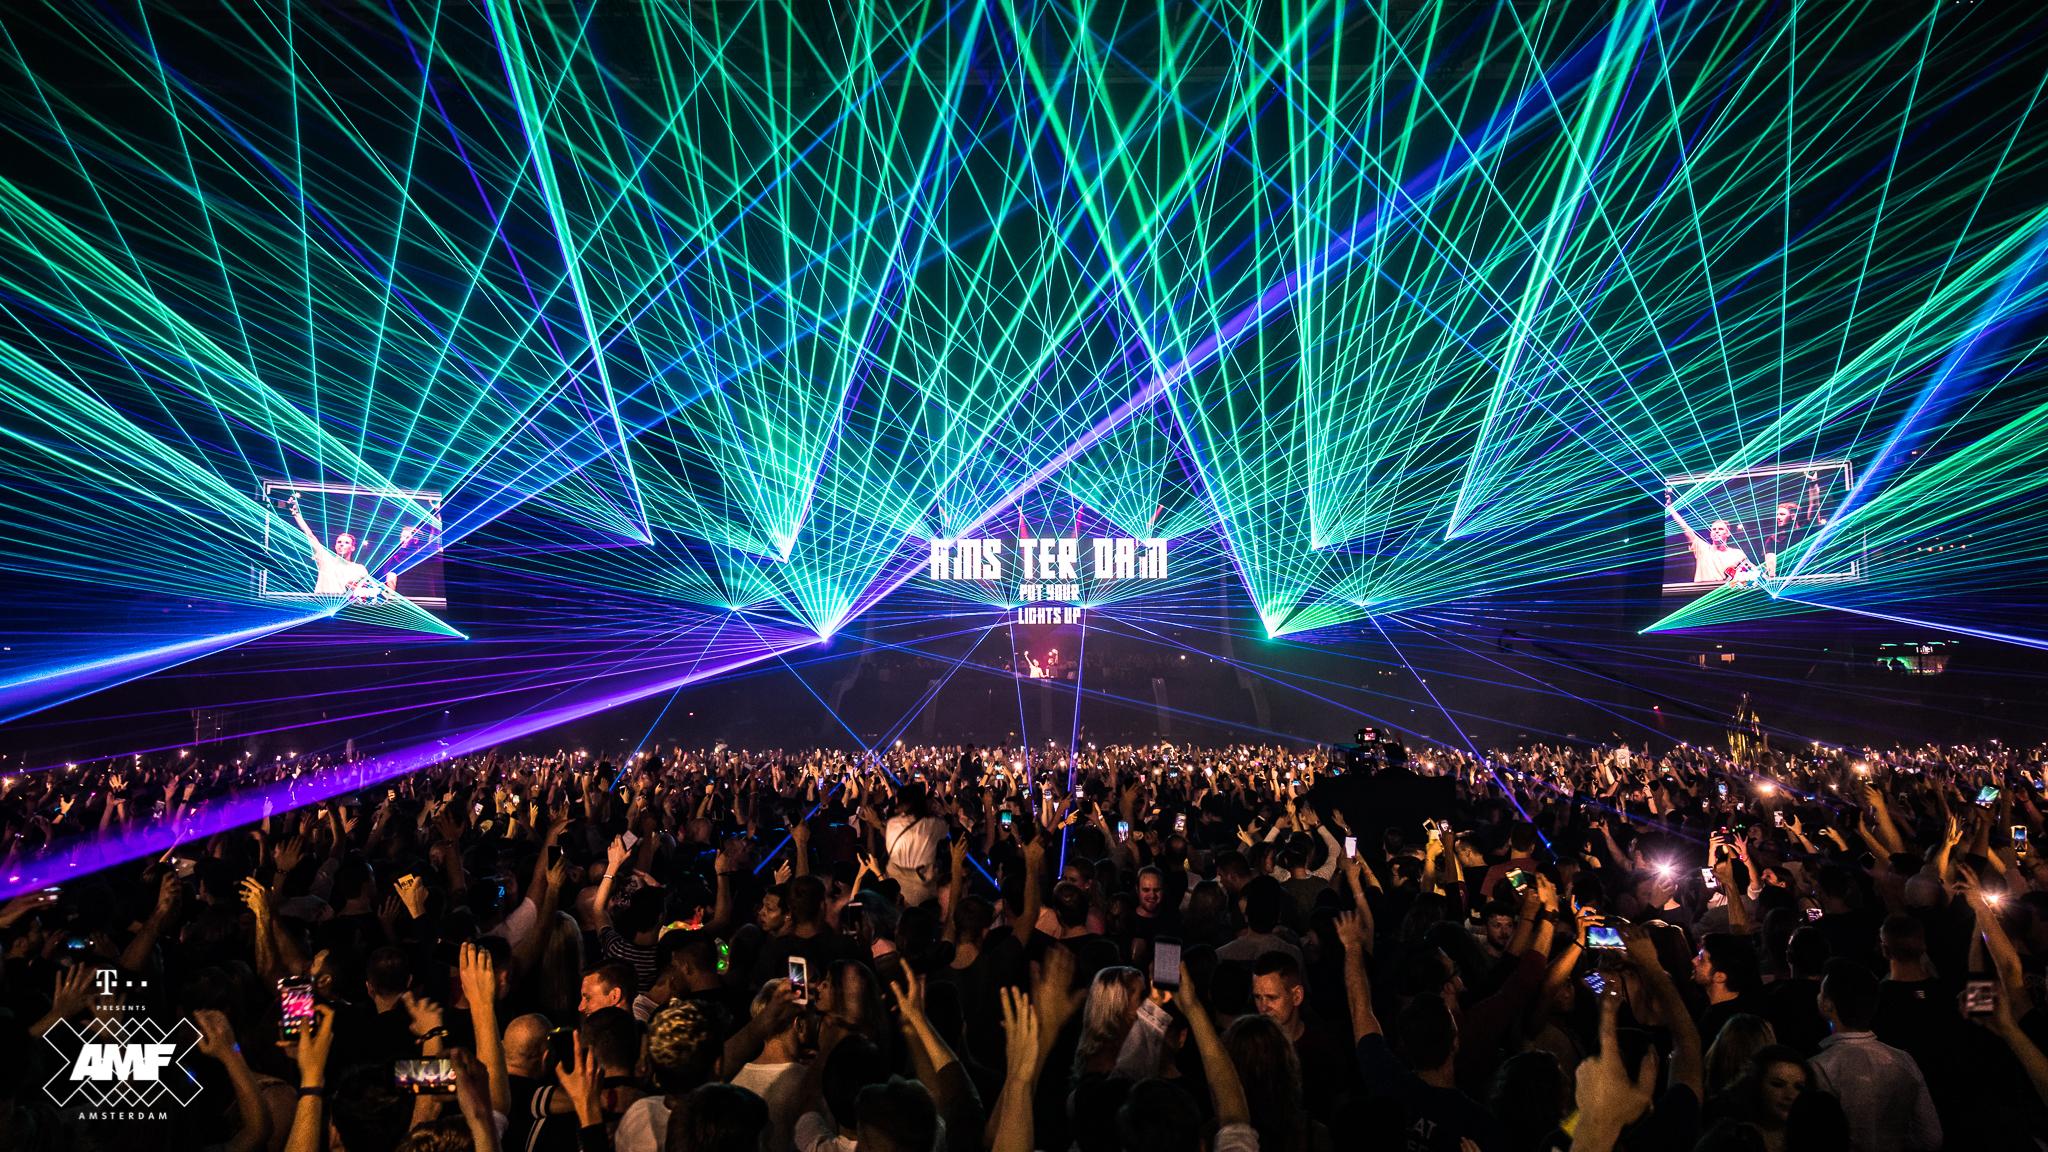 Martin Garrix wins the DJ Mag Top 100 DJs poll: 17 amazing snaps